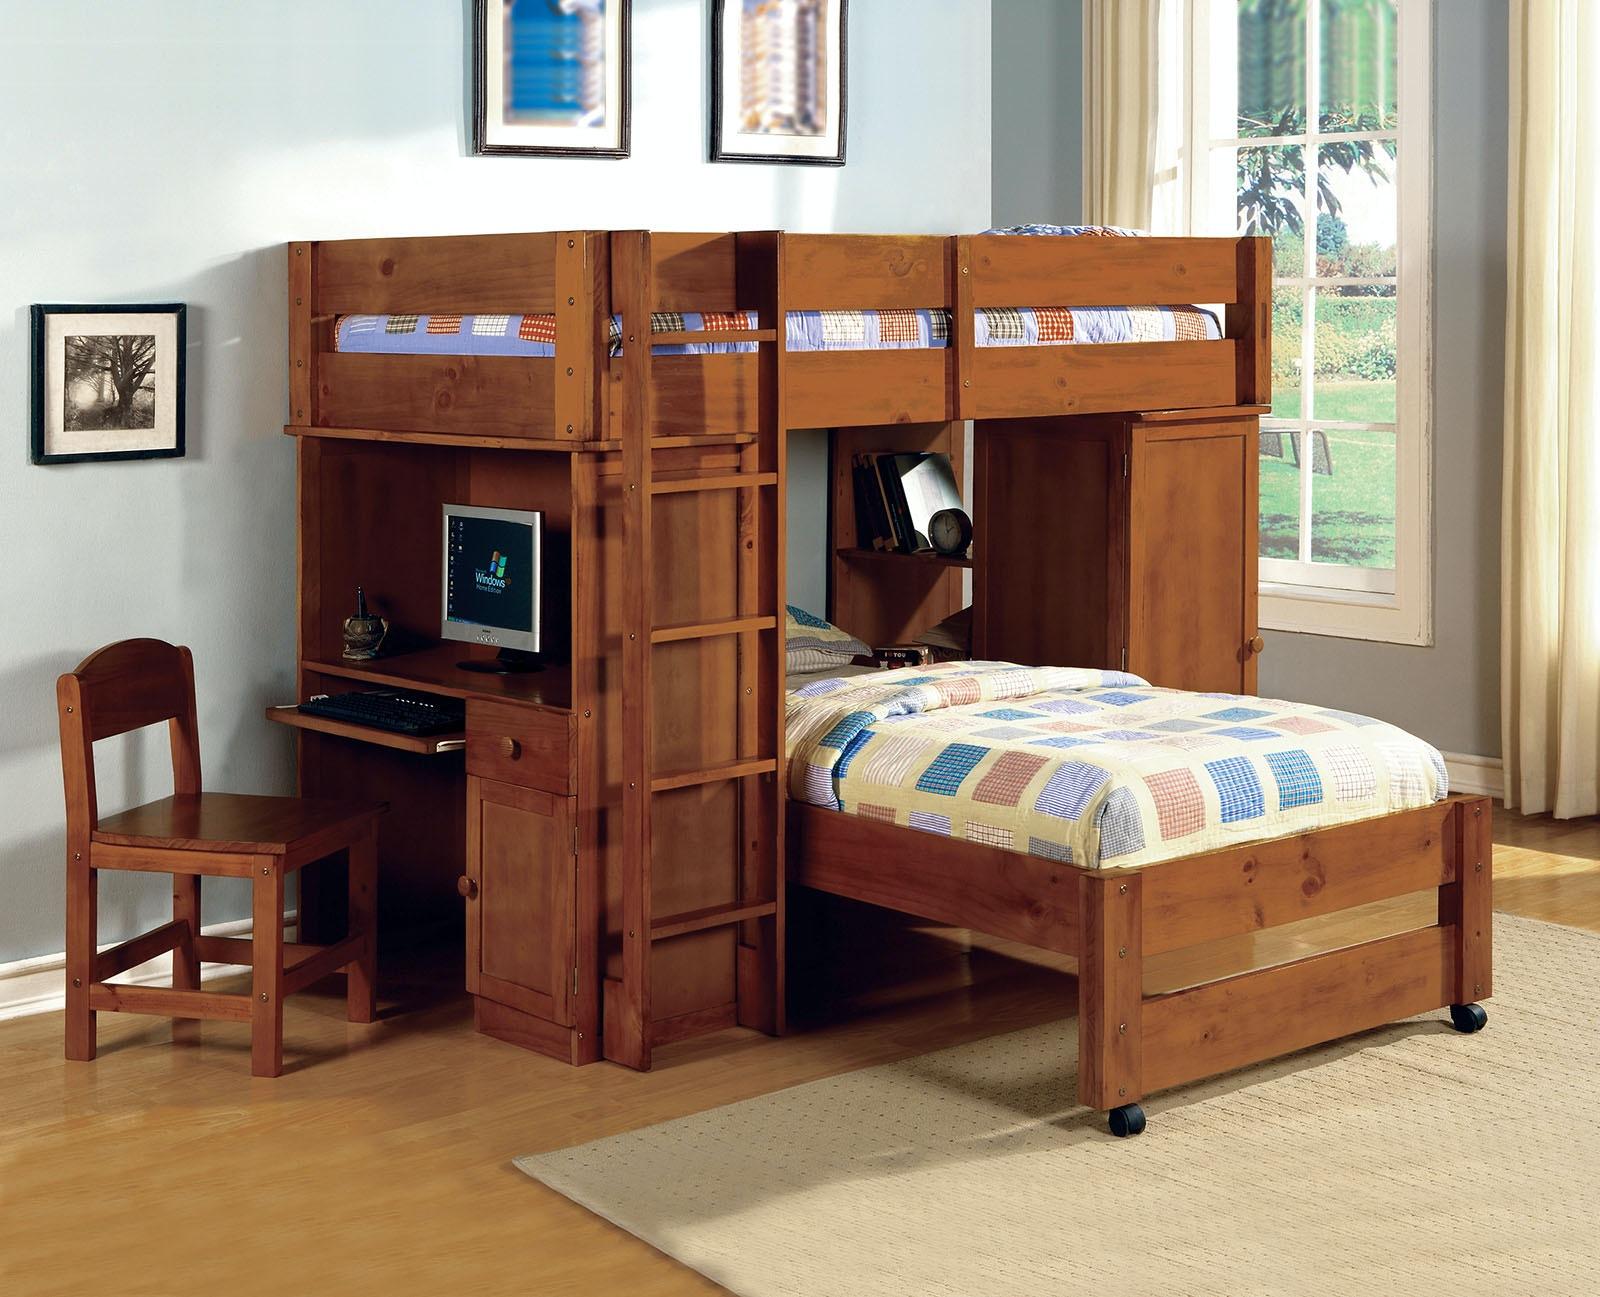 Furniture of America All-In-One Twin/Twin Loft Bed Dark Oak & Furniture of America Bedroom All-In-One Twin/Twin Loft Bed Dark Oak ...